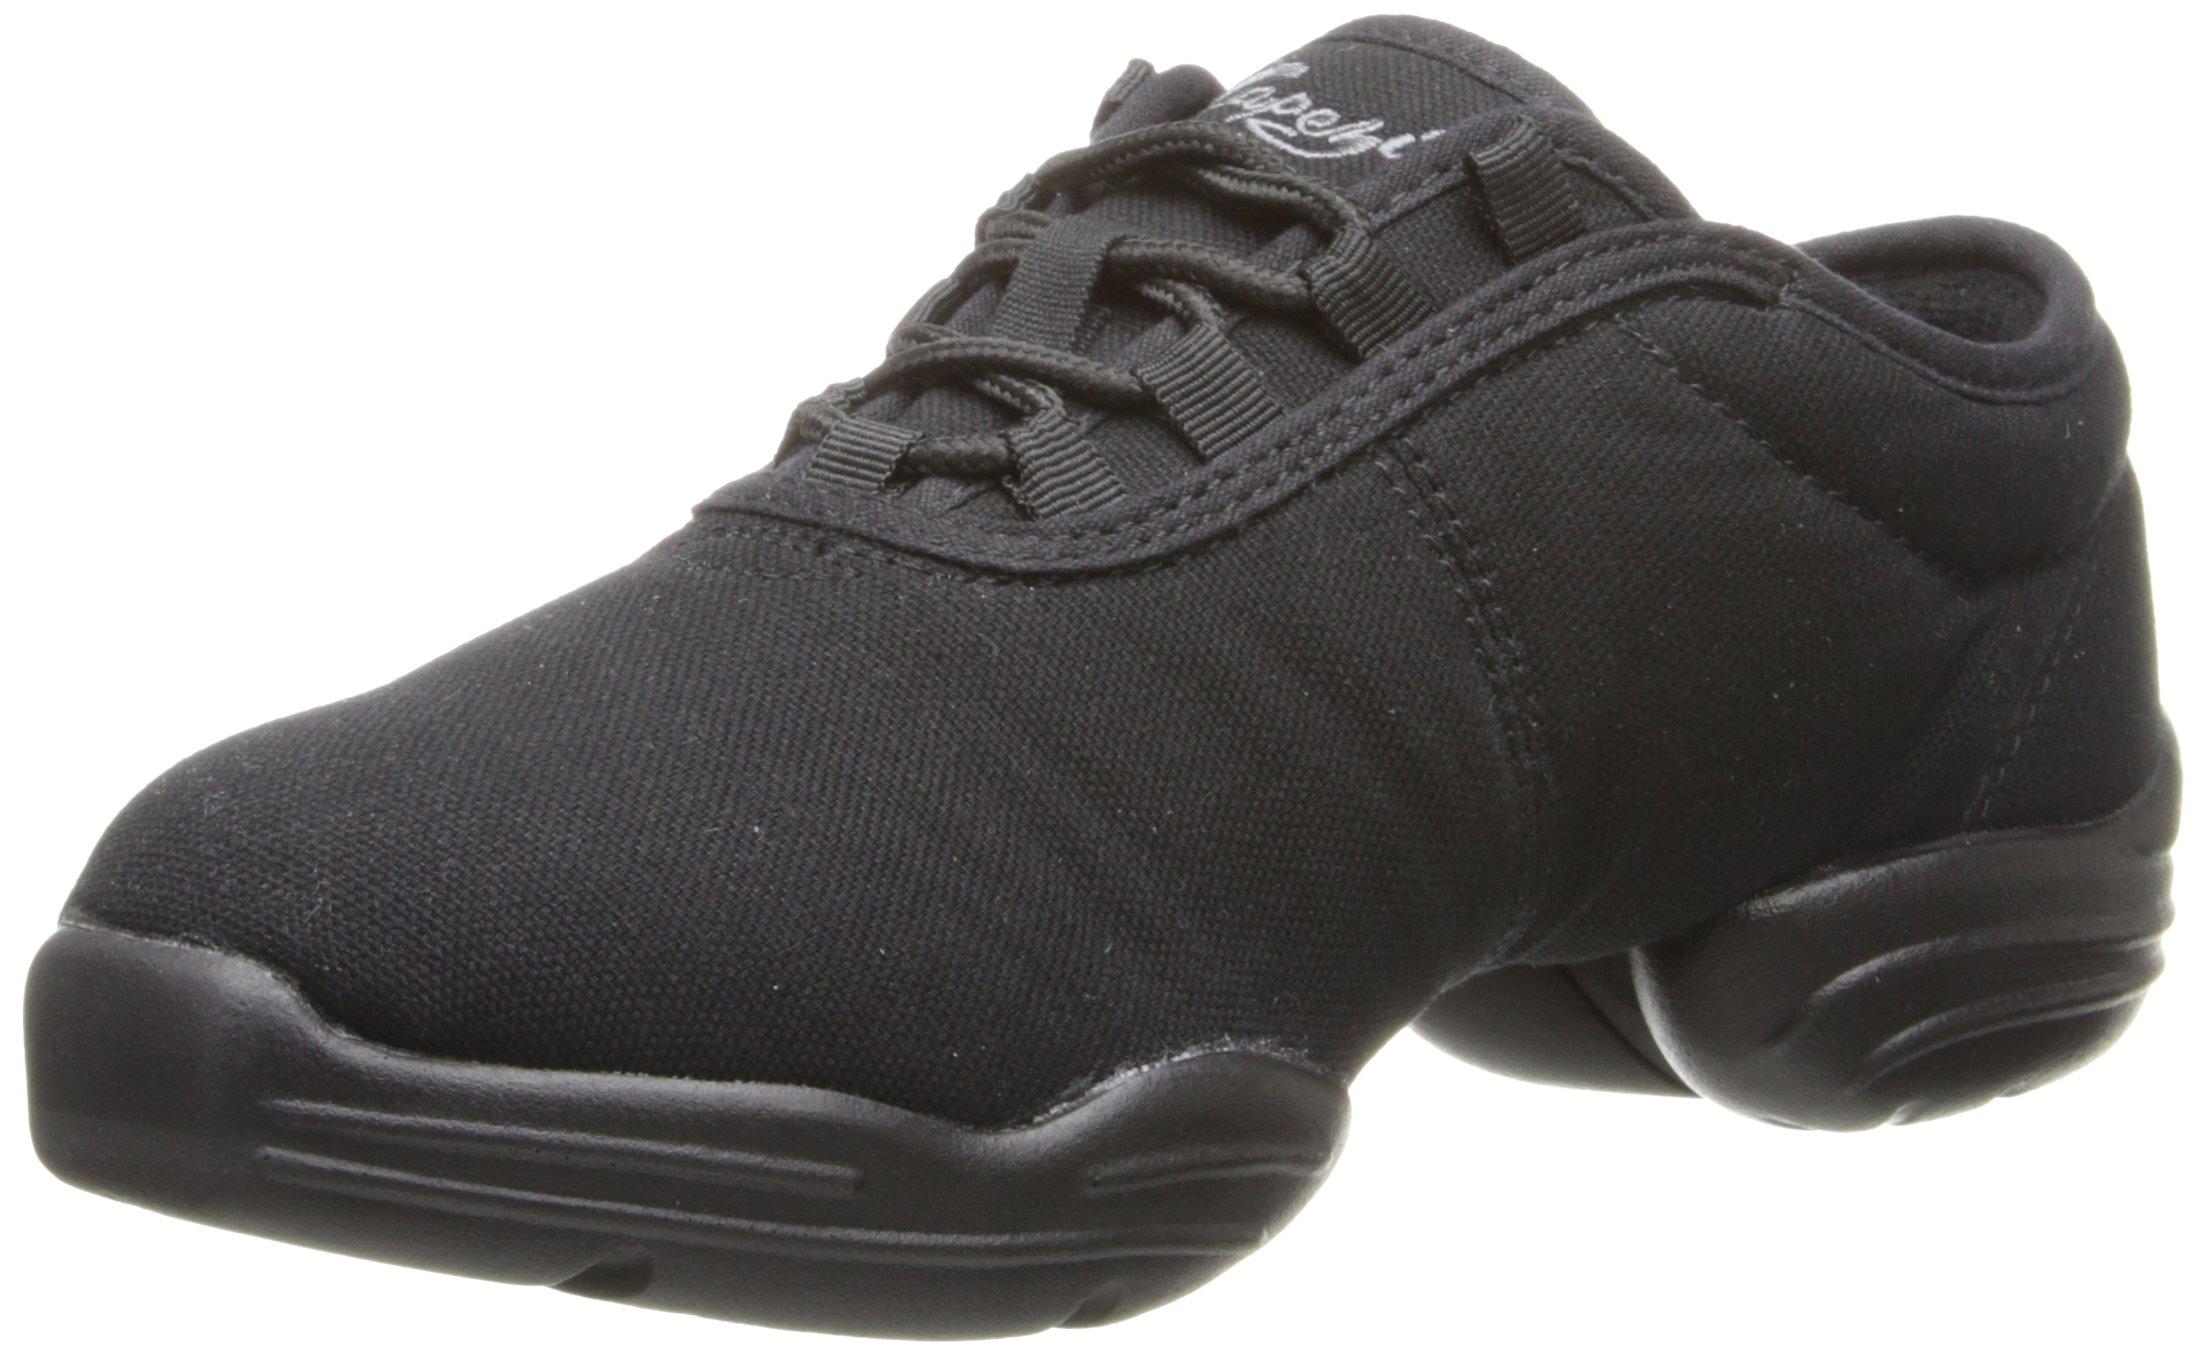 Capezio  Canvas Dance Sneaker,Black,10.5 M US